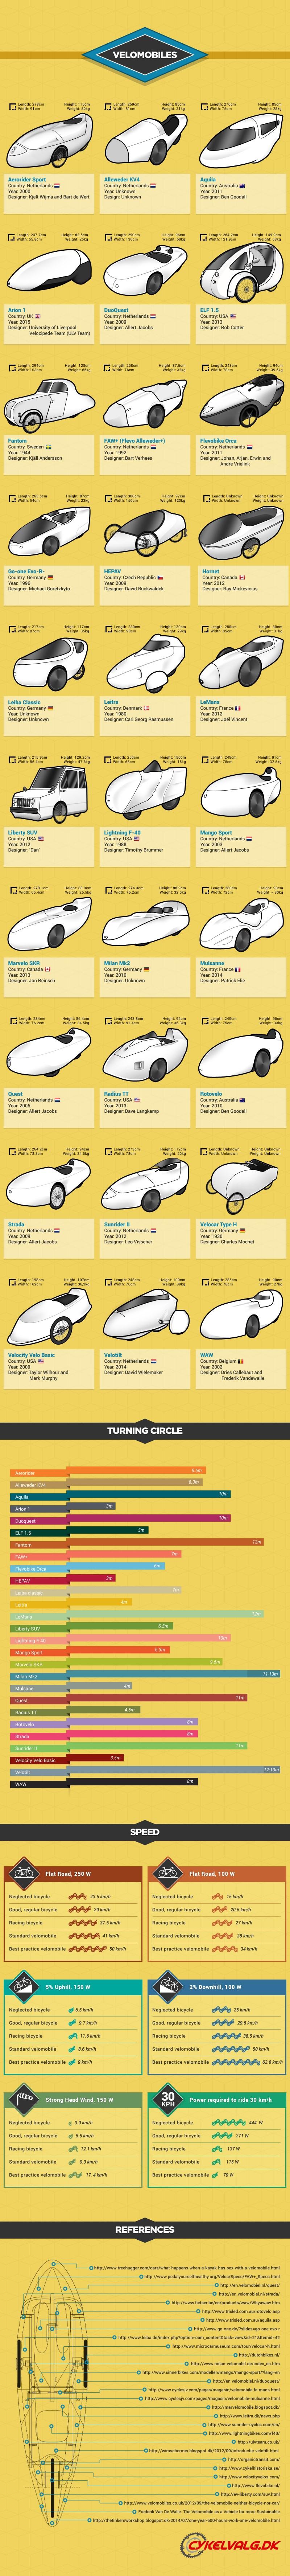 velomobiles-infographic.jpg